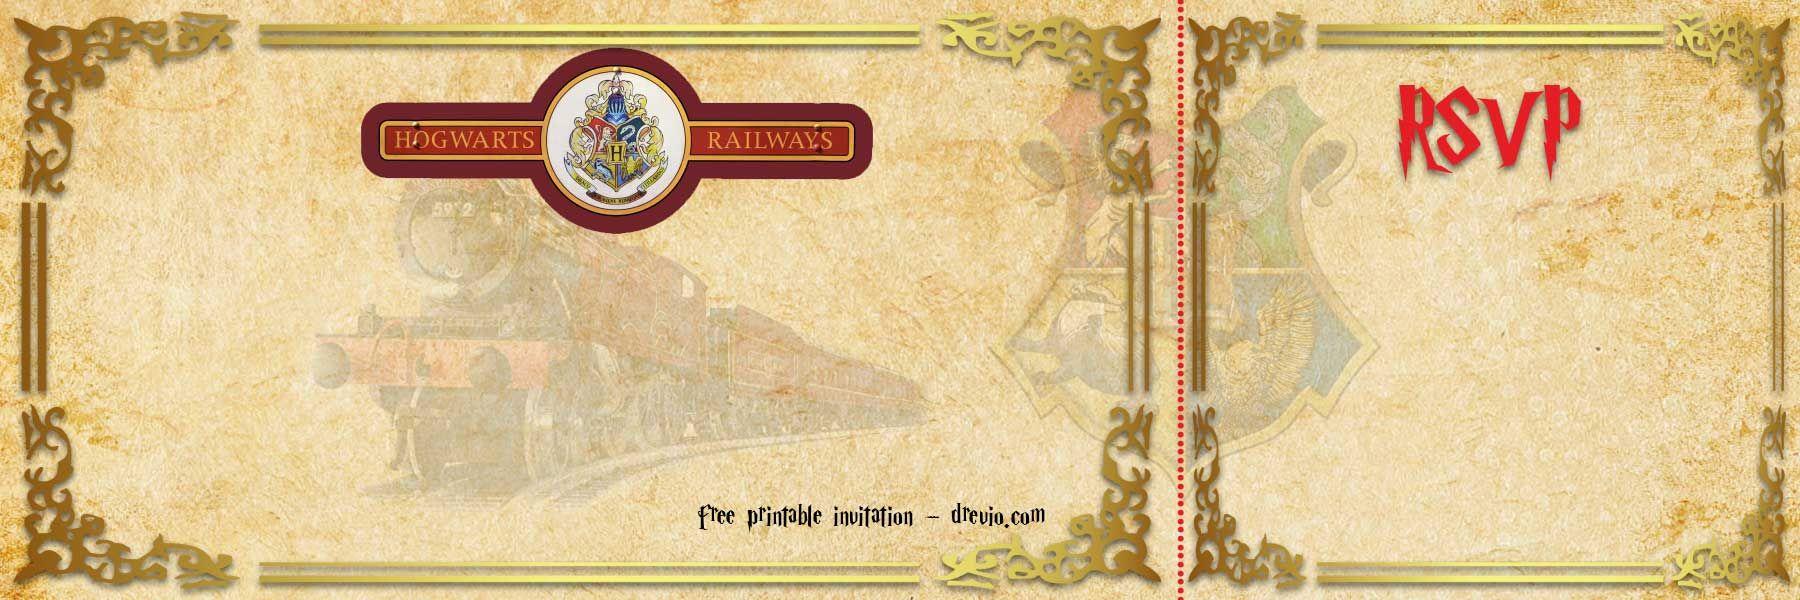 Free Printable Hogwarts Express Ticket Invitation Template